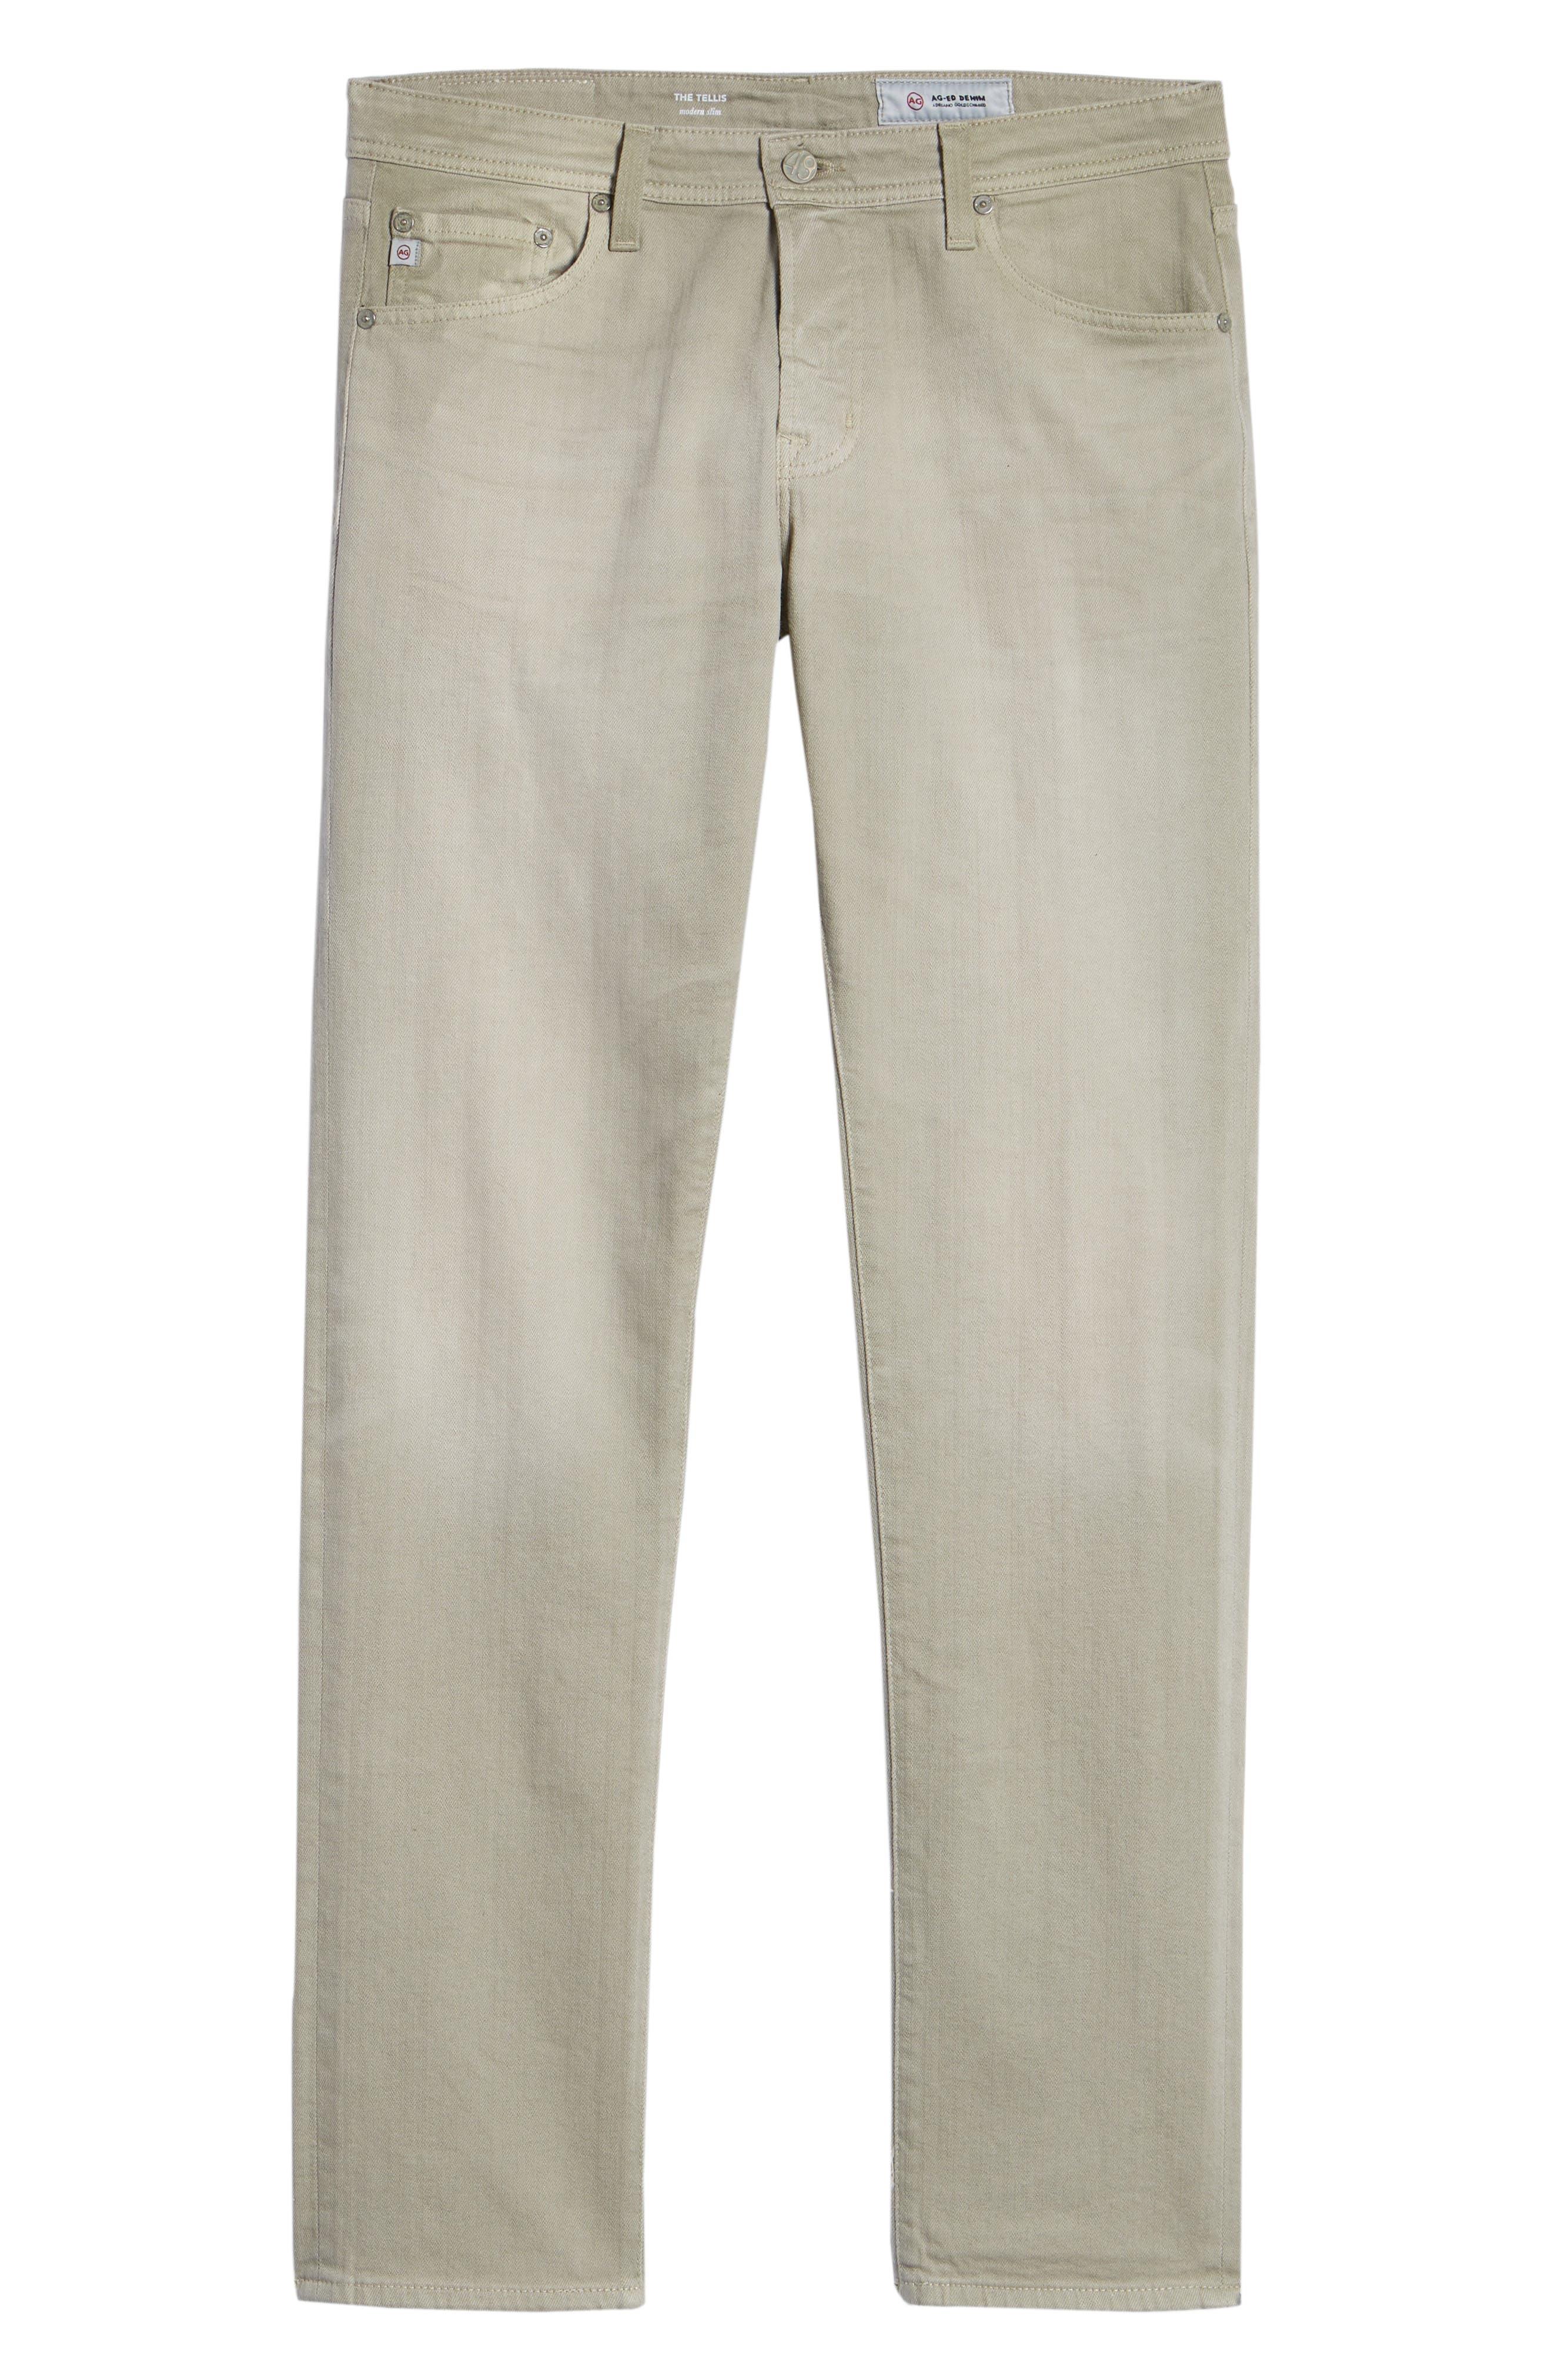 Tellis Slim Leg Twill Pants,                             Alternate thumbnail 6, color,                             7 Years Sand Beige